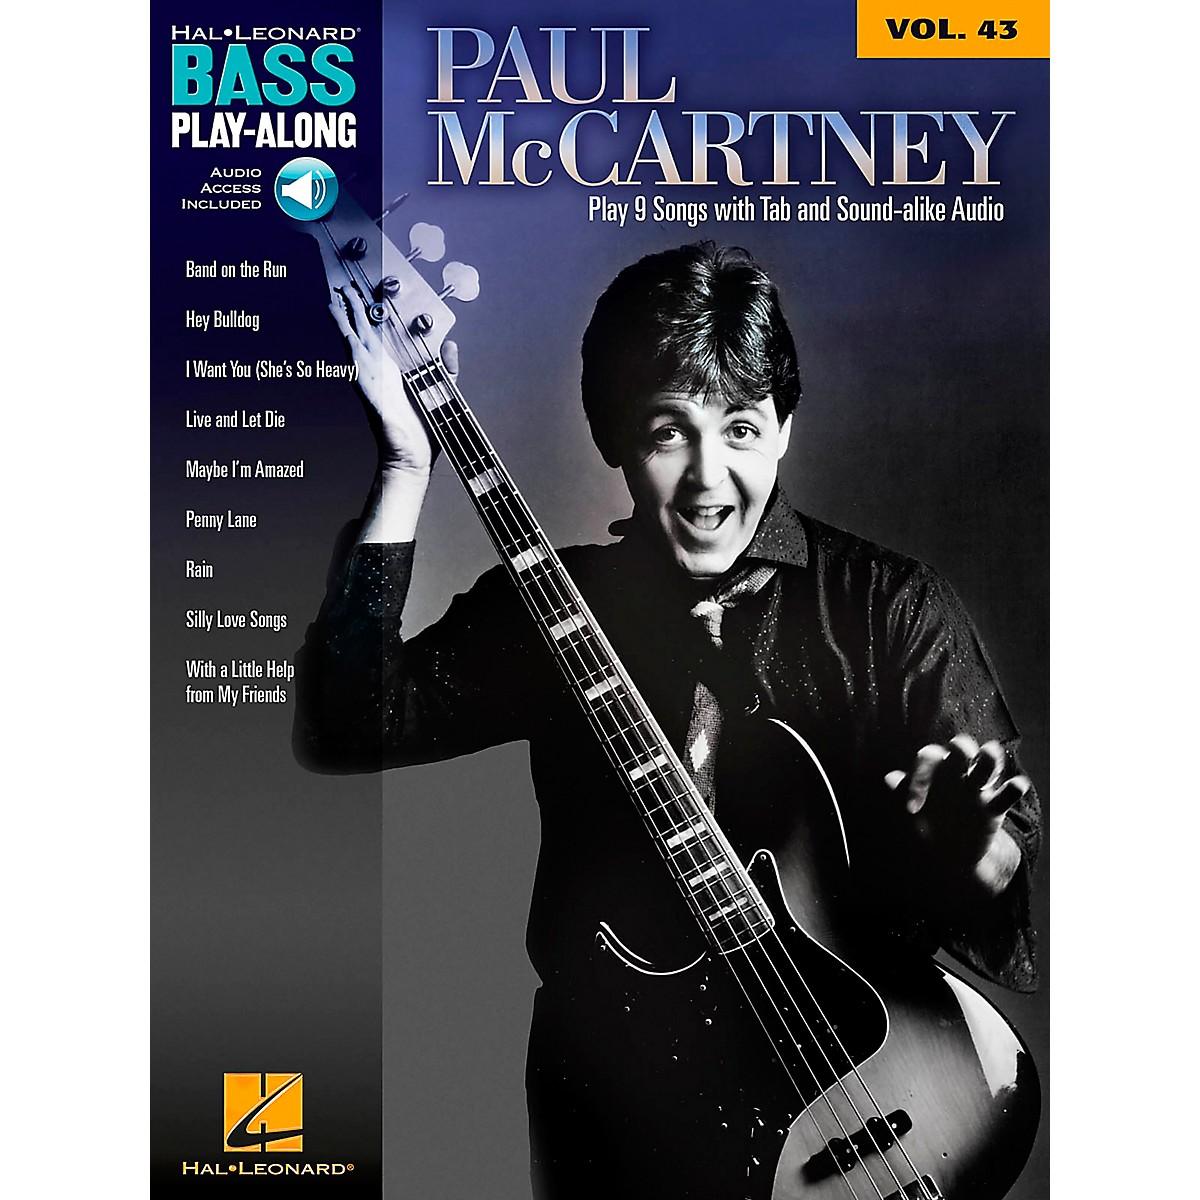 Hal Leonard Paul McCartney - Bass Play-Along Volume 43 Book/CD